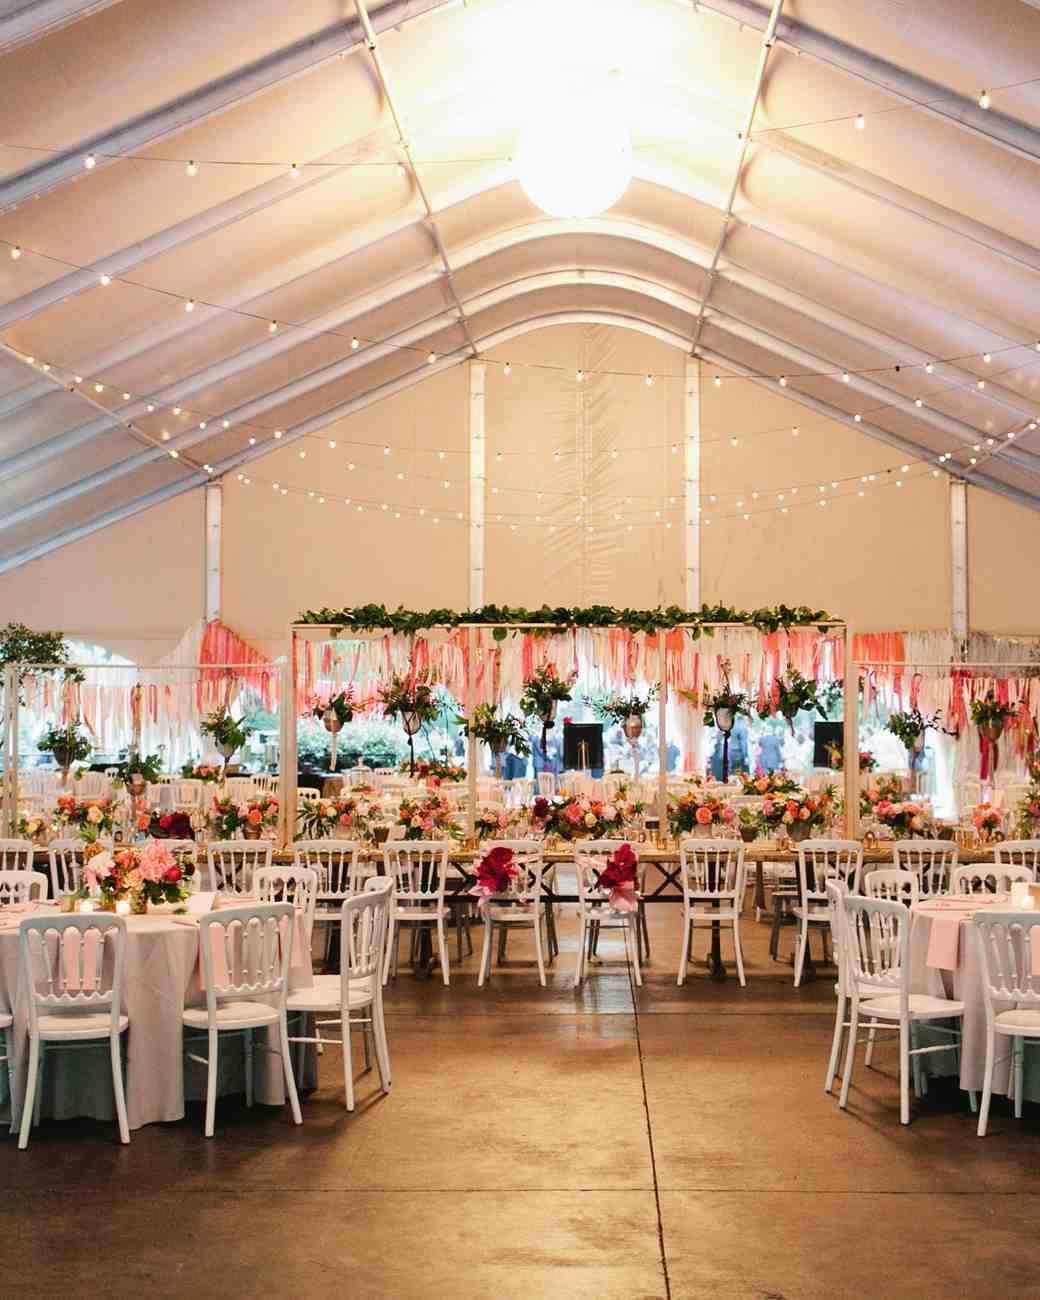 holly-john-wedding-texas-reception-tent-092-s112833-0516.jpg